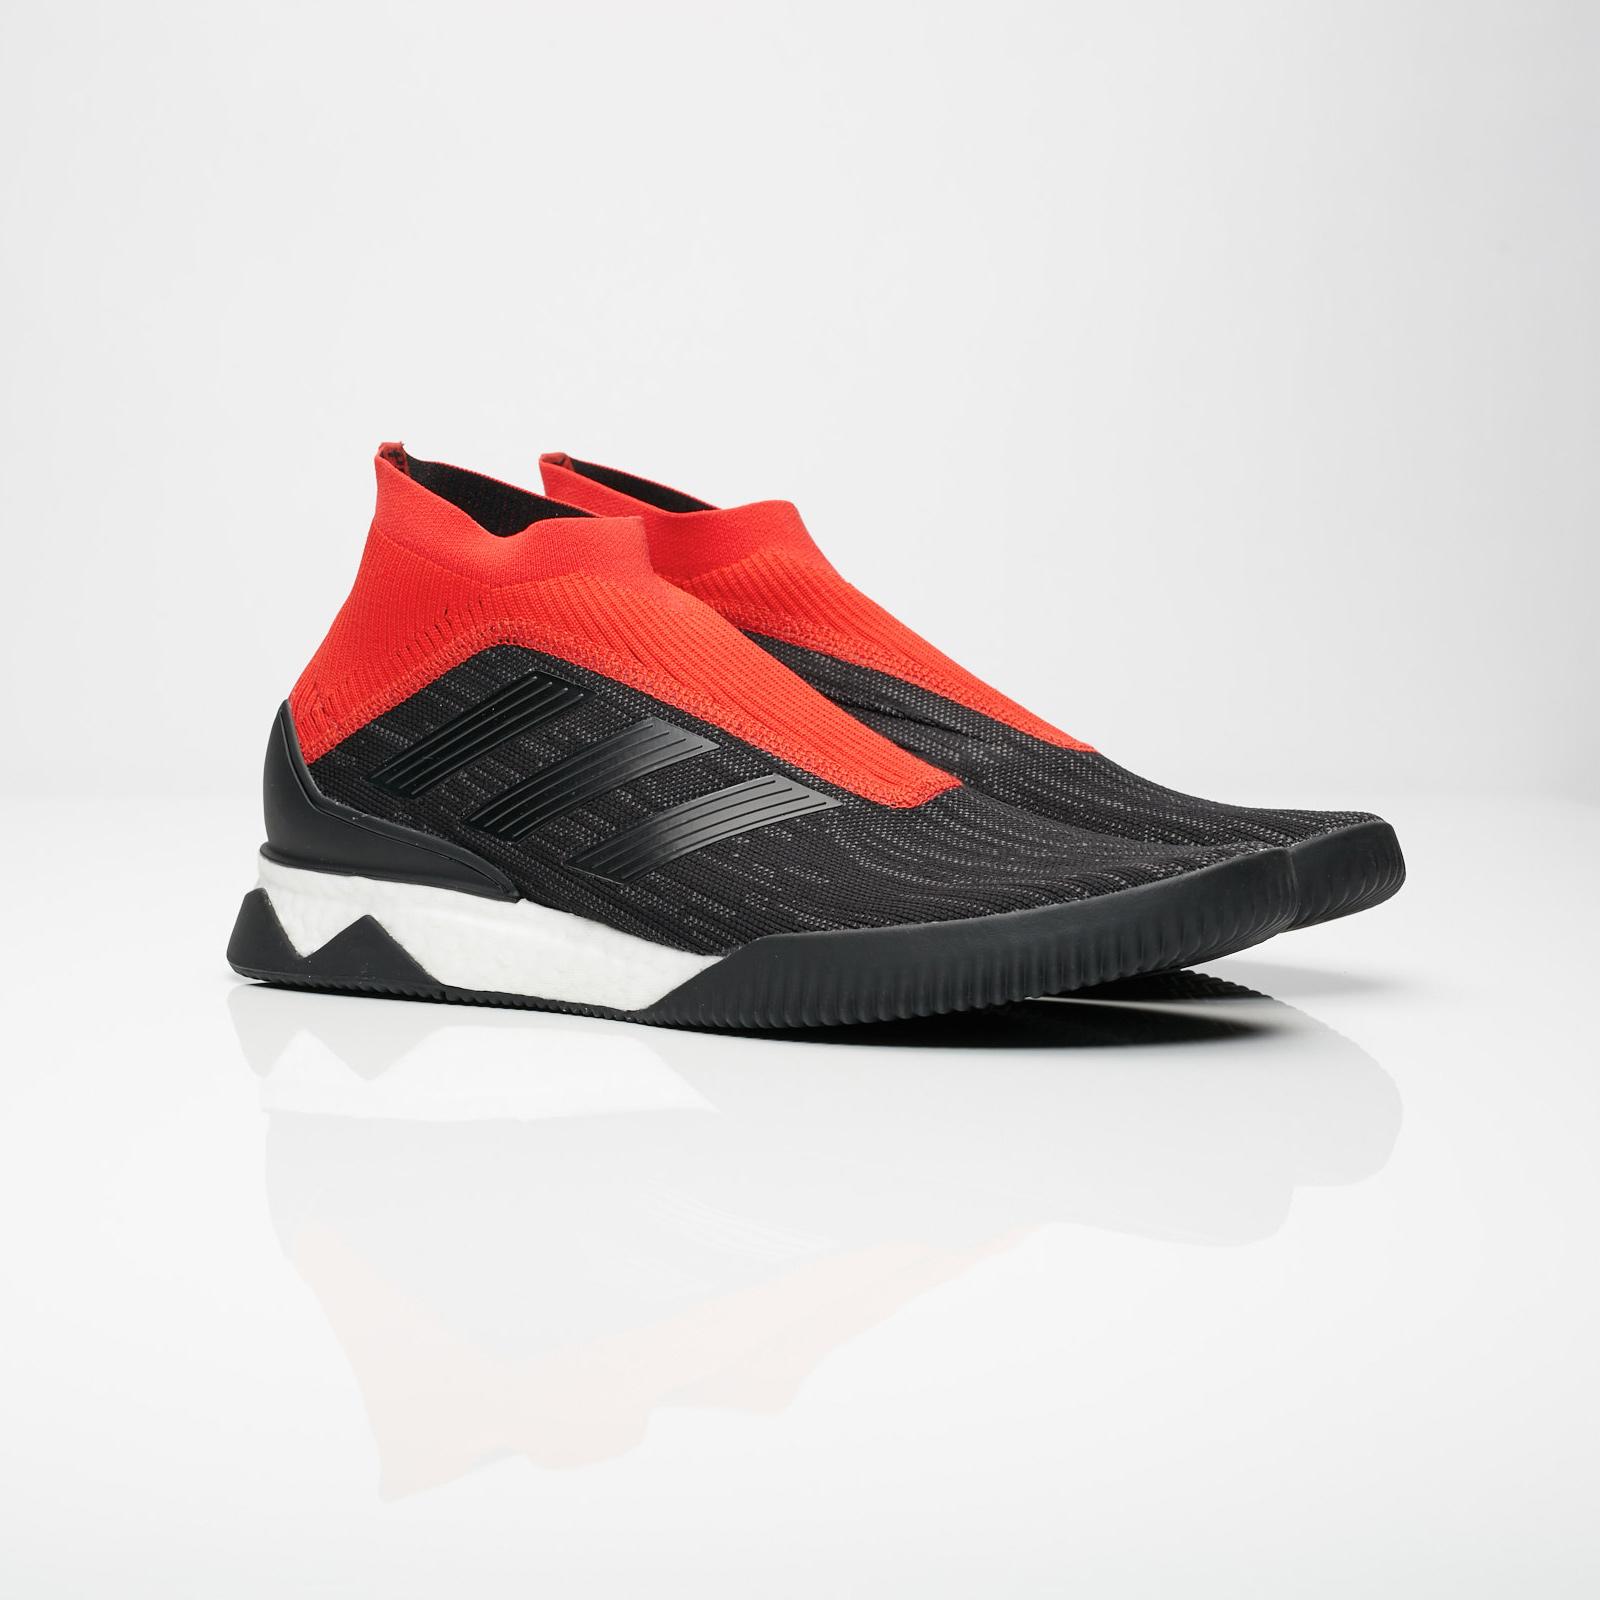 e0ff47e5da14e adidas Predator Tango 18+ TR - Aq0603 - Sneakersnstuff